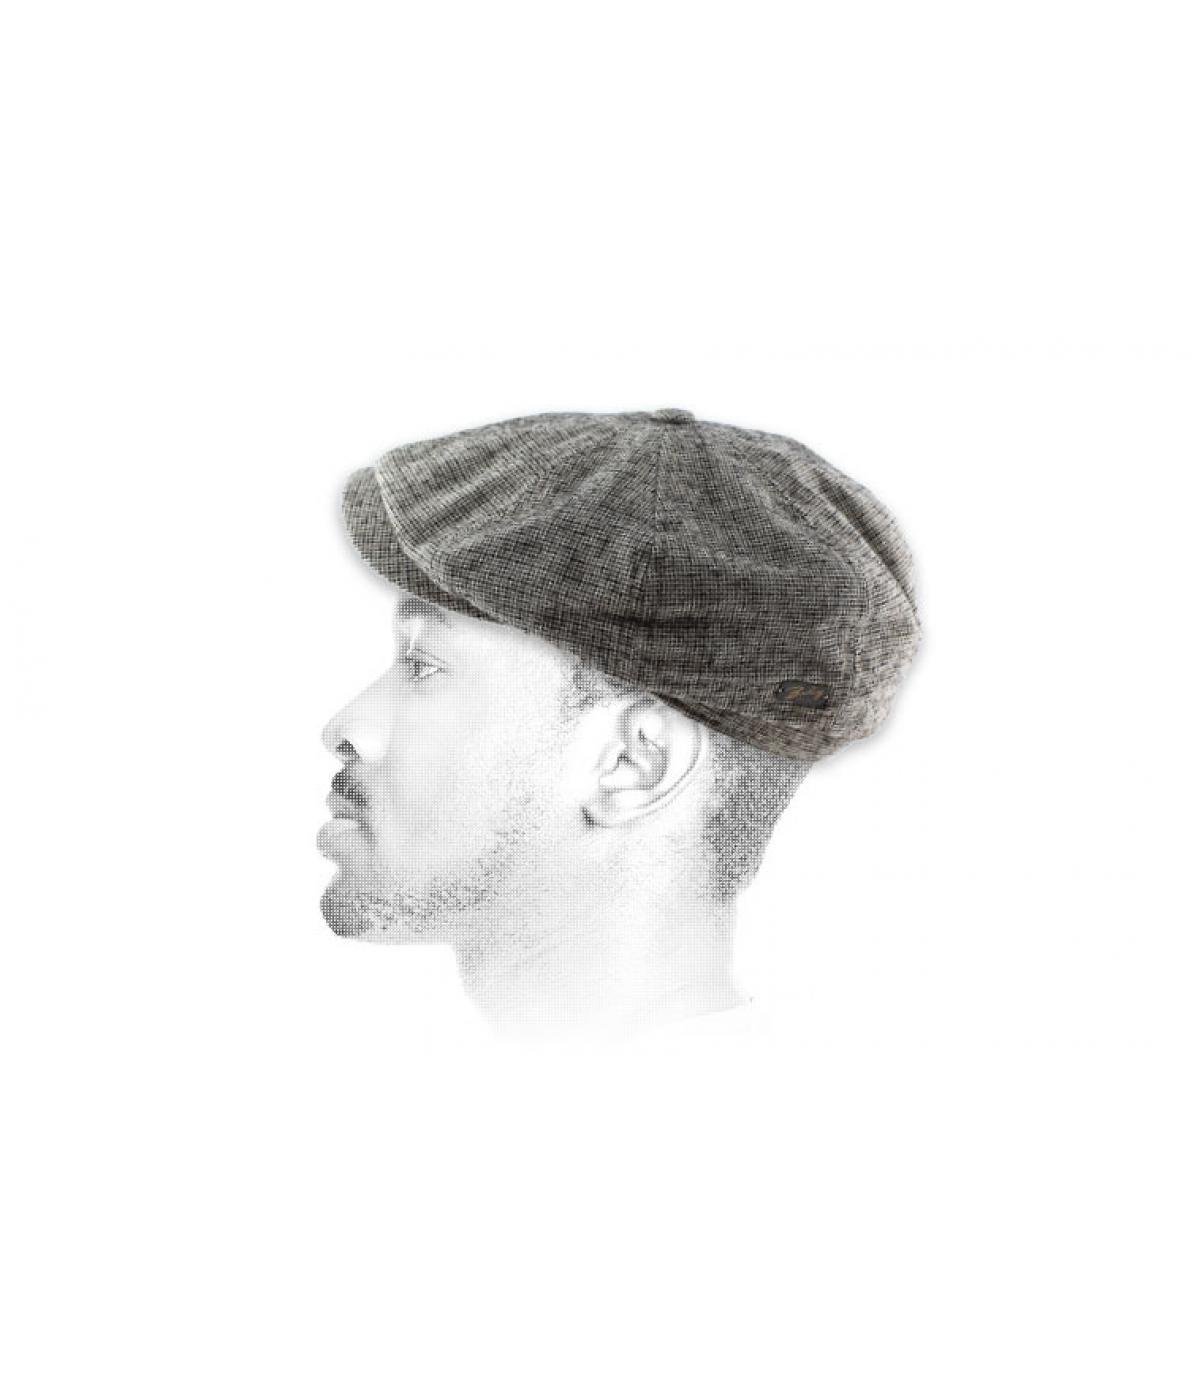 Houndstooth newboys cap